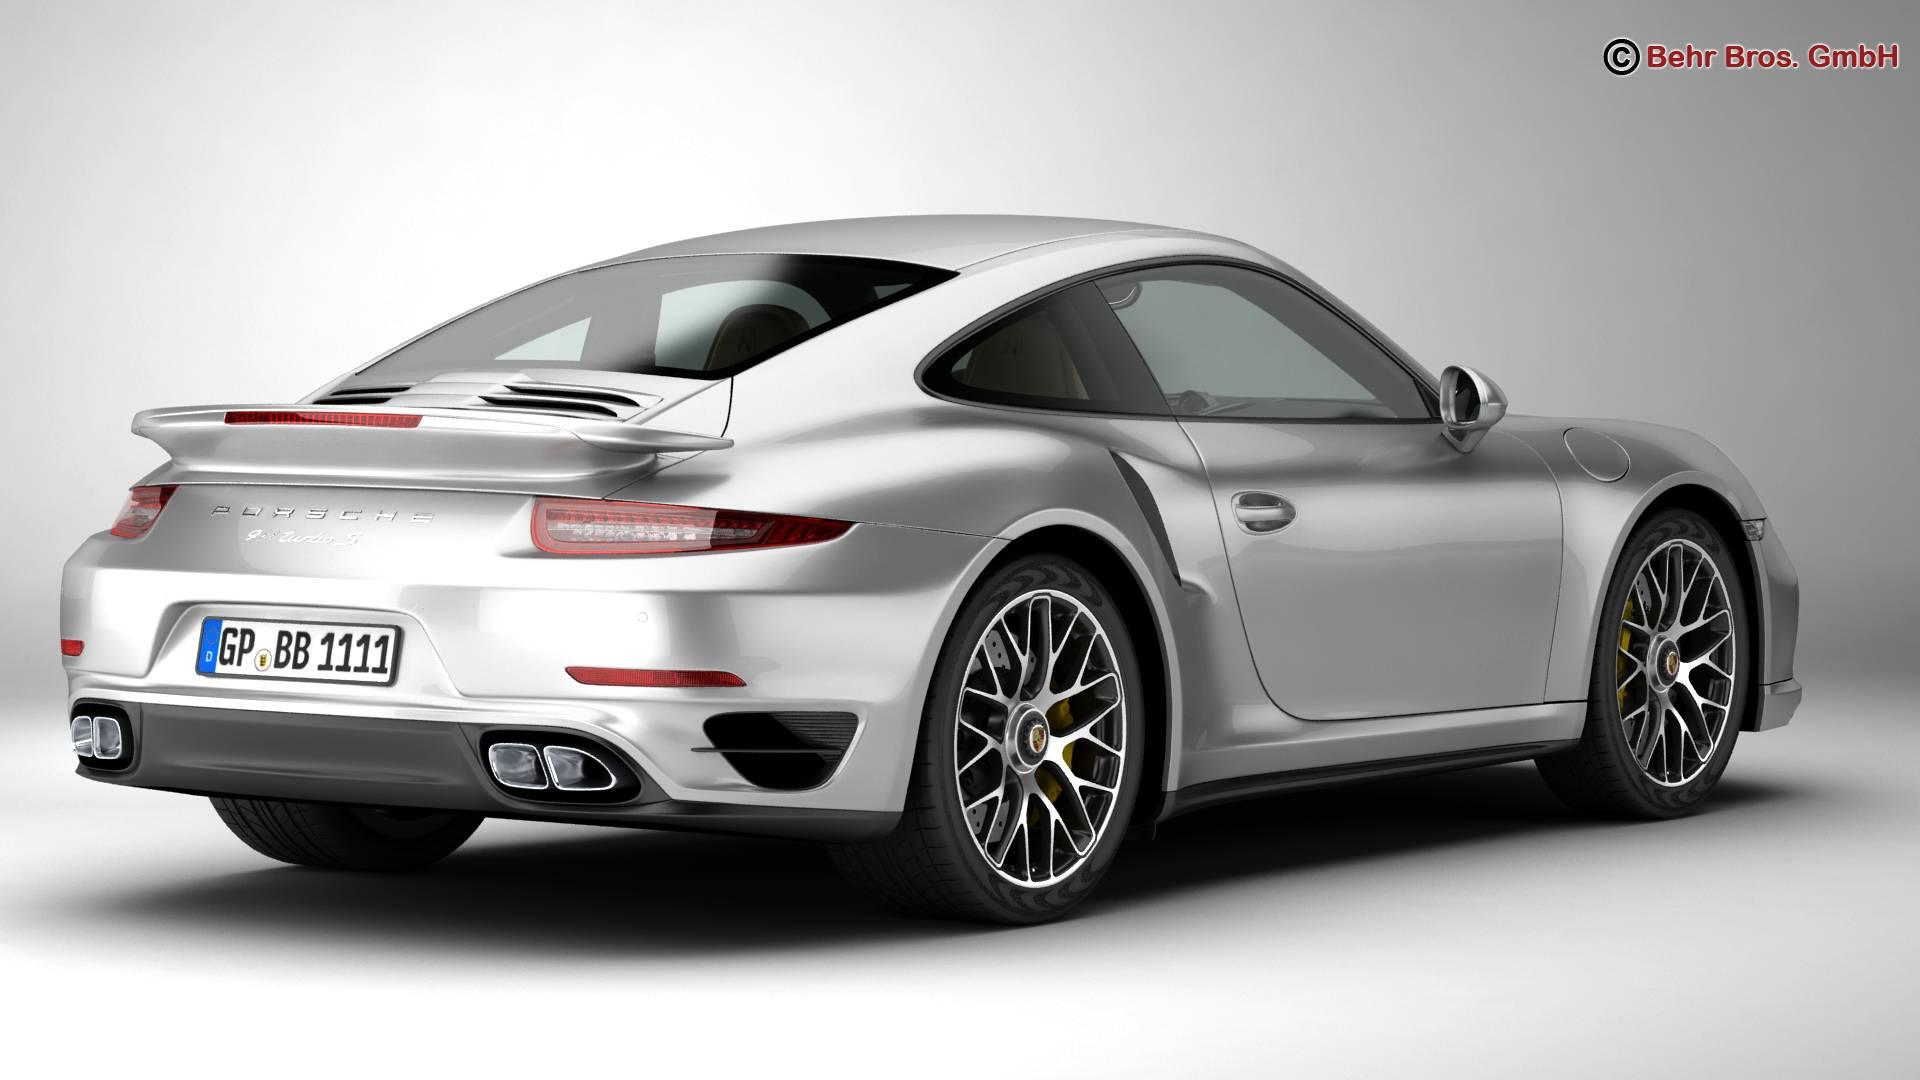 porsche 911 turbo s 2014 3d model 3ds max fbx c4d lwo ma mb obj 212478